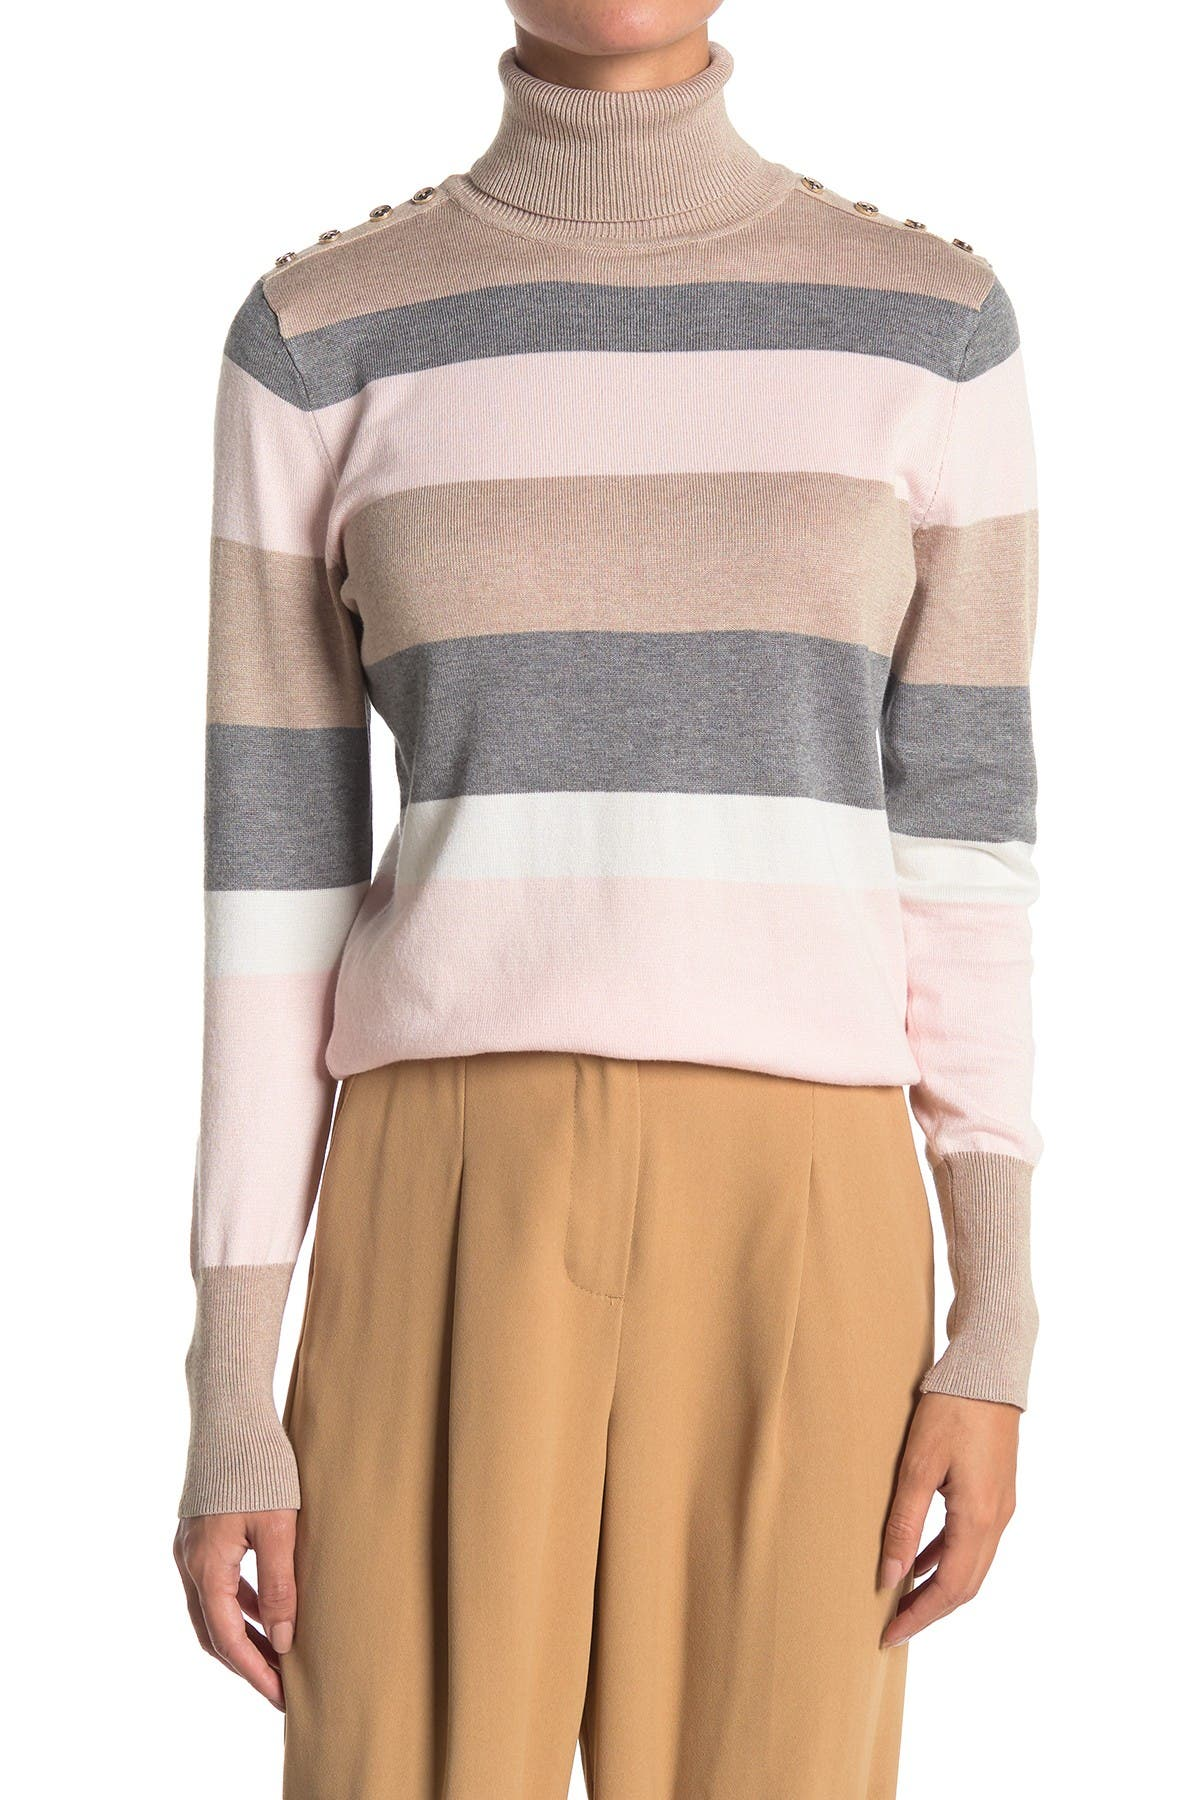 Image of JOSEPH A Striped Knit Turtleneck Sweater